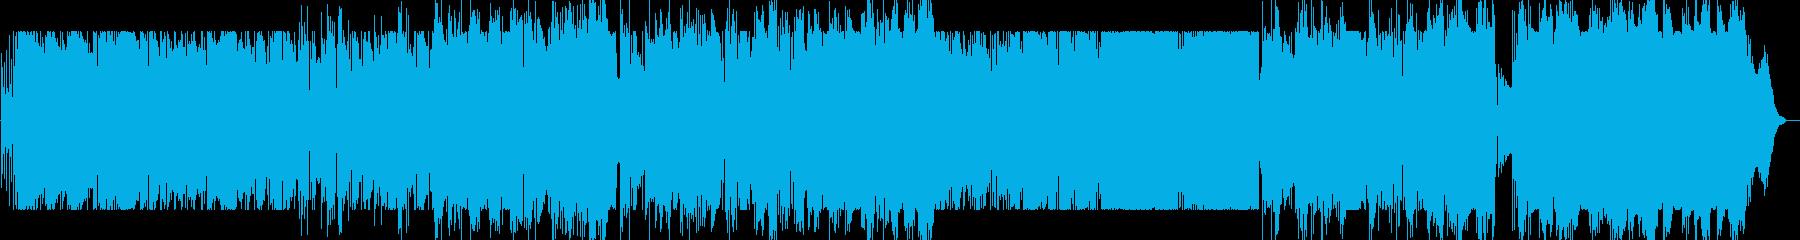 Jazzyなブルースバラード(日米録音)の再生済みの波形